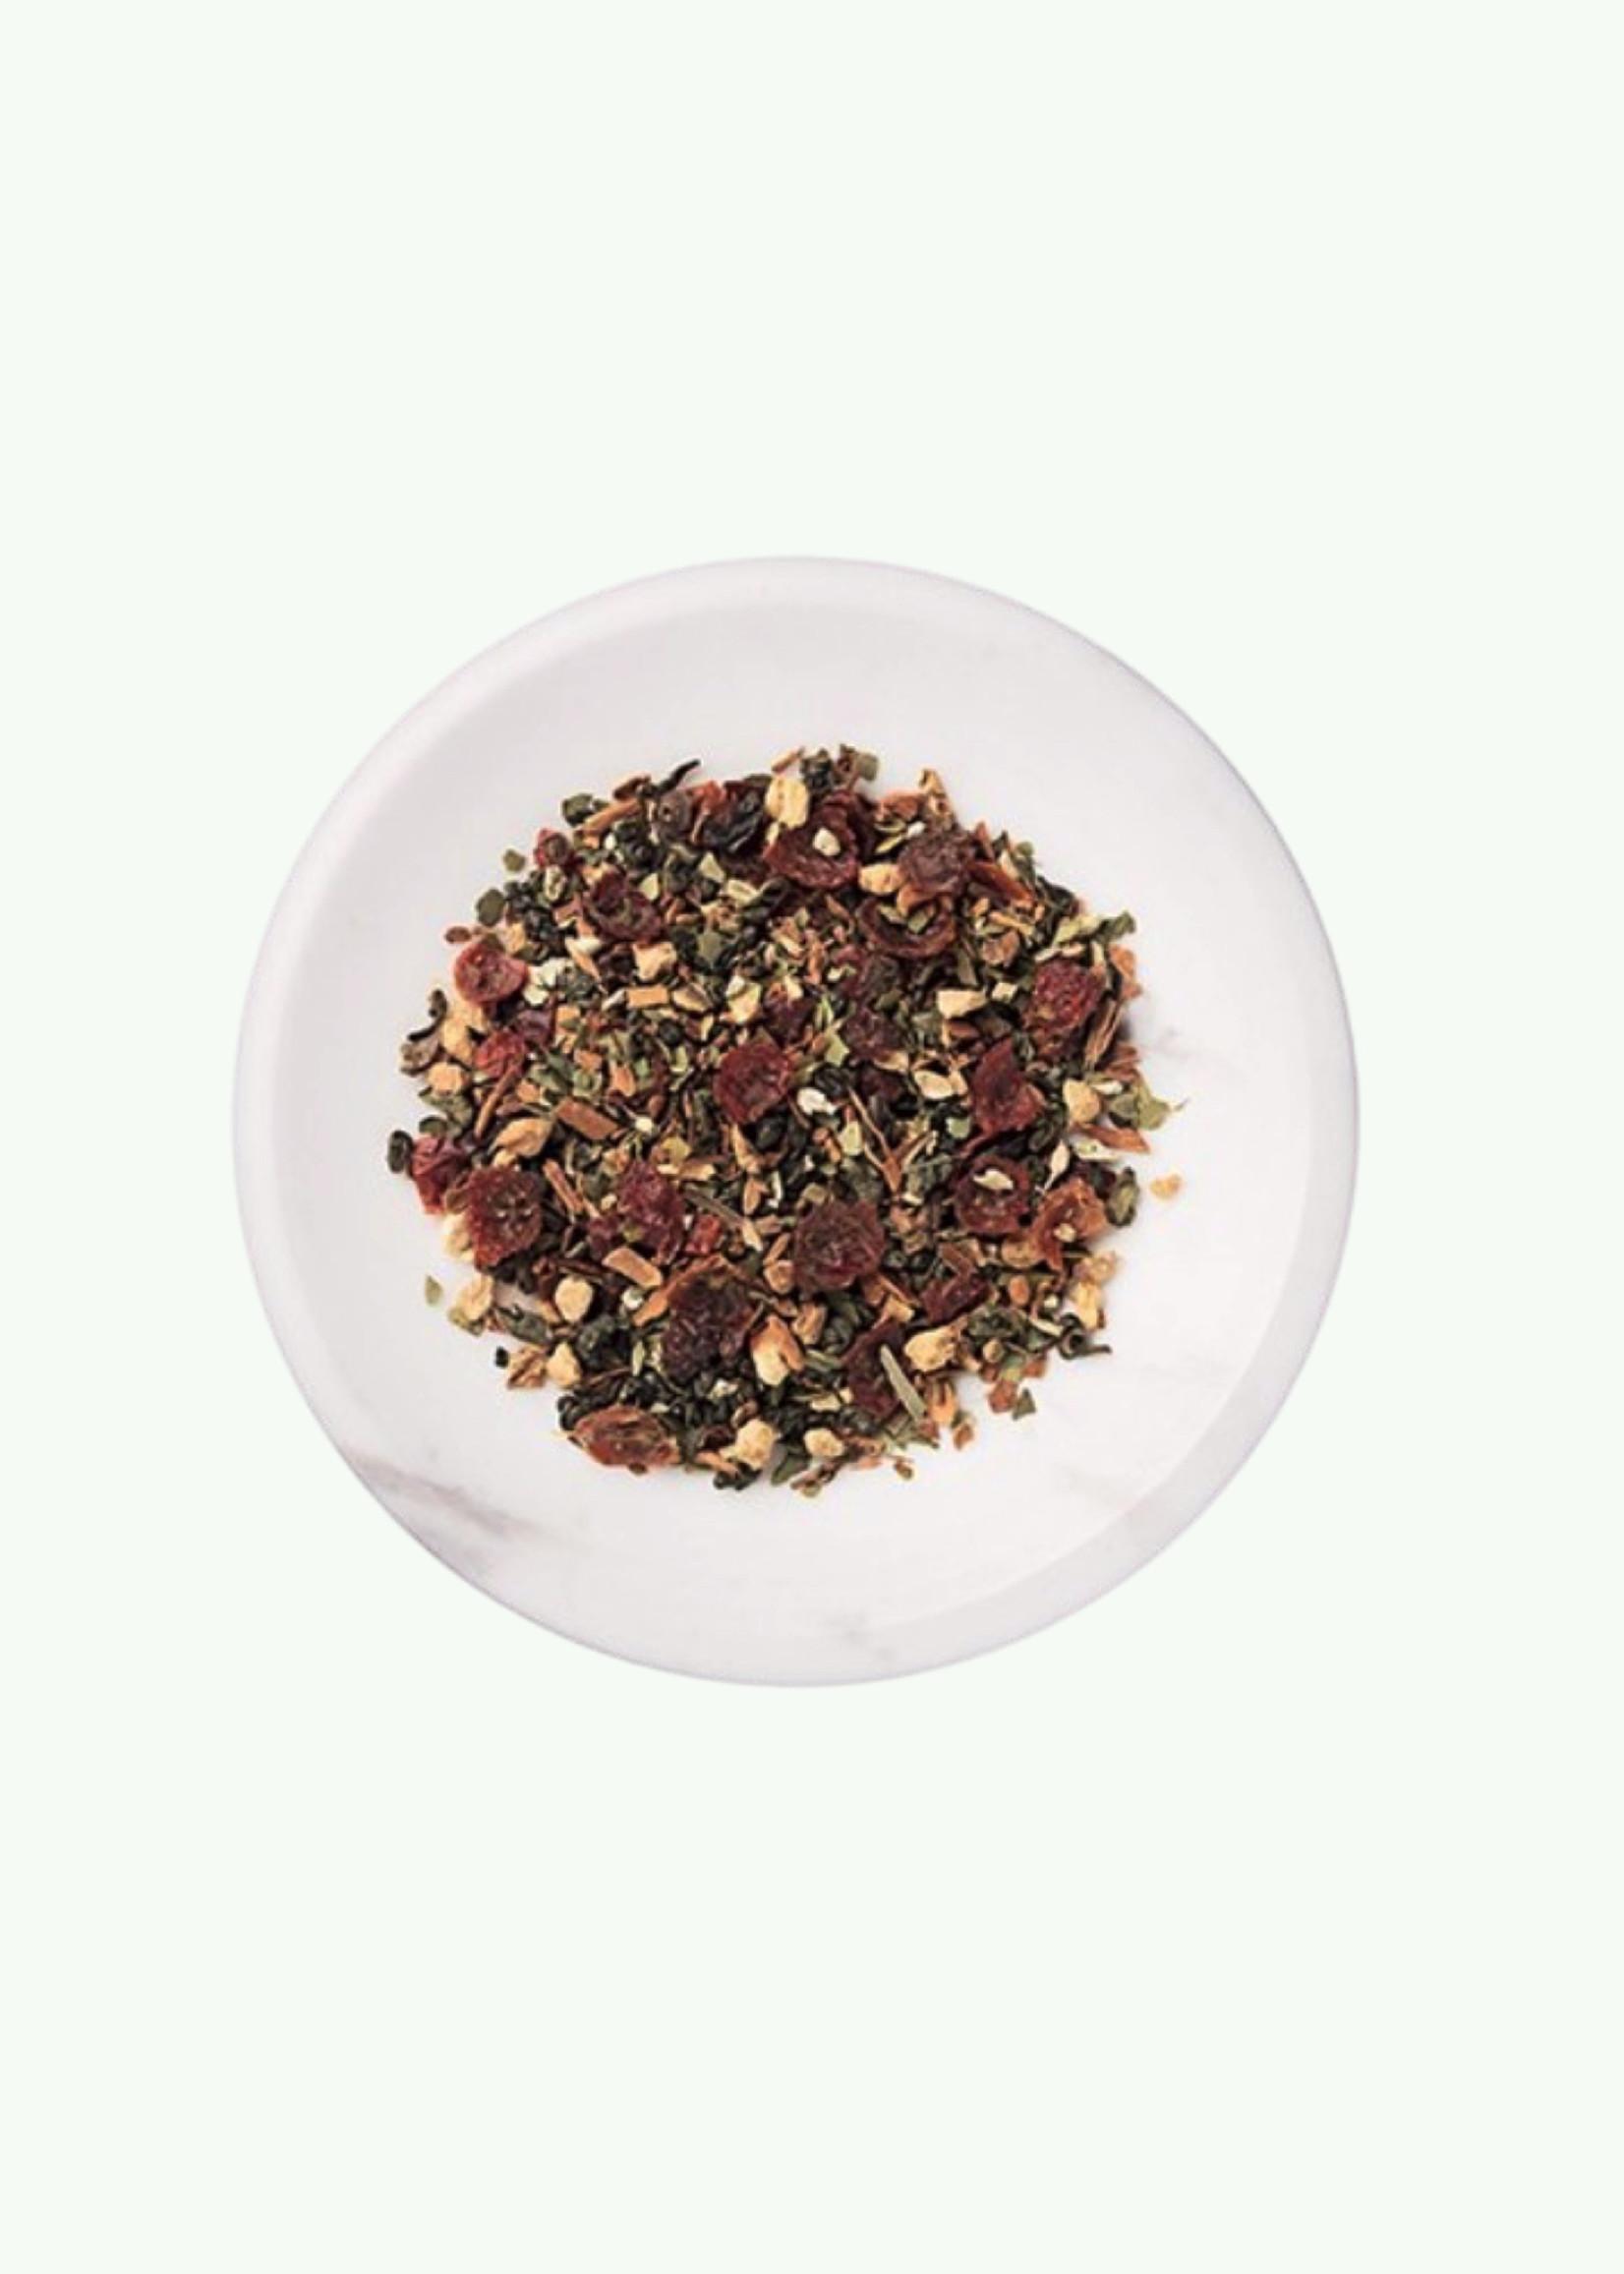 Label Bougie Label Bougie - La Superbe - Geurkaars 180 gr en Infusie met groene thee 80 gr